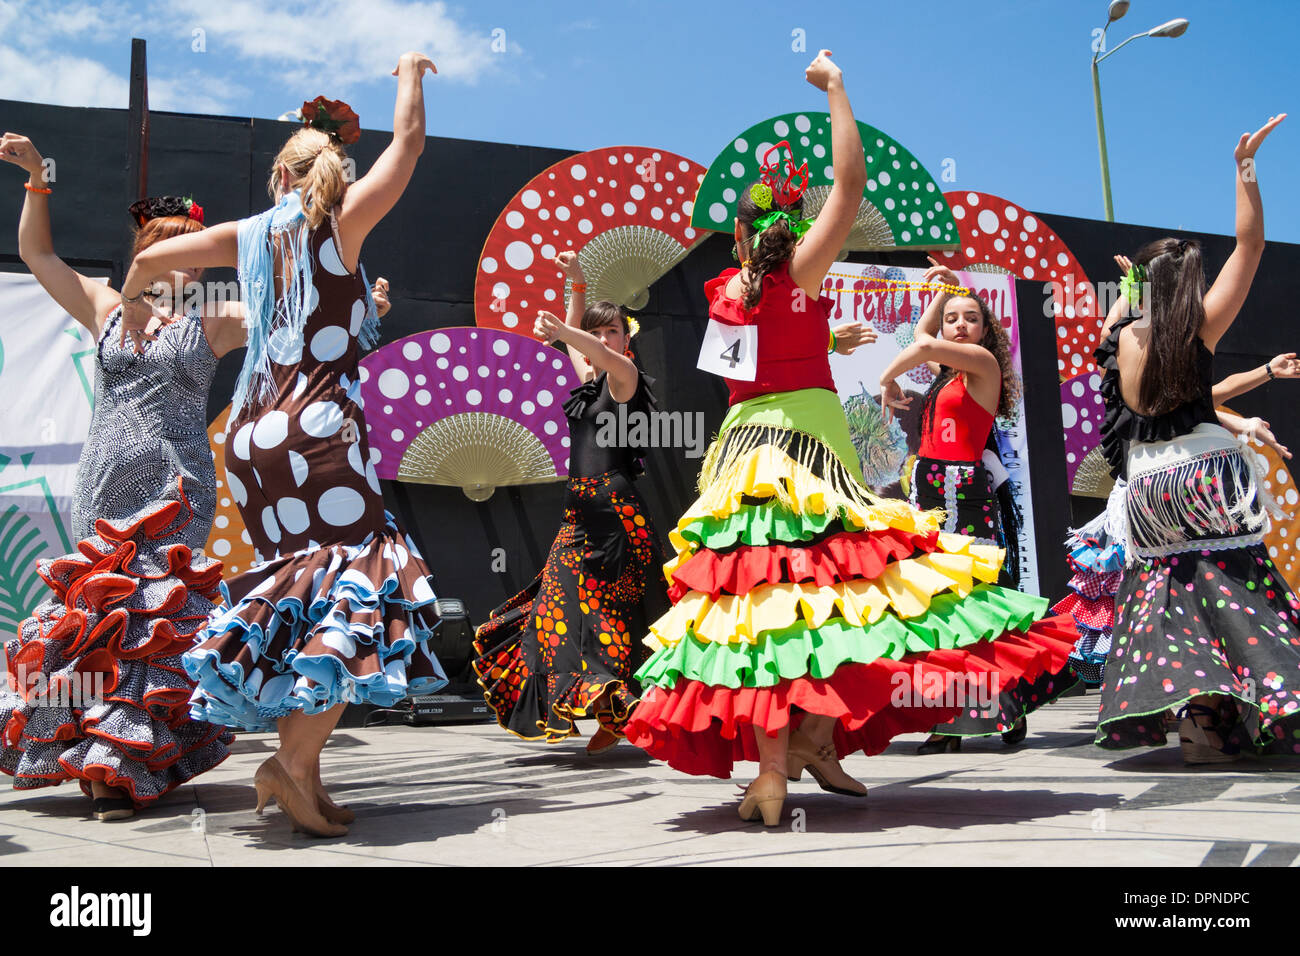 Danseurs de Flamenco Flamenco Feria de Abril au week-end à Las Palmas, Gran Canaria, îles Canaries, Espagne Photo Stock